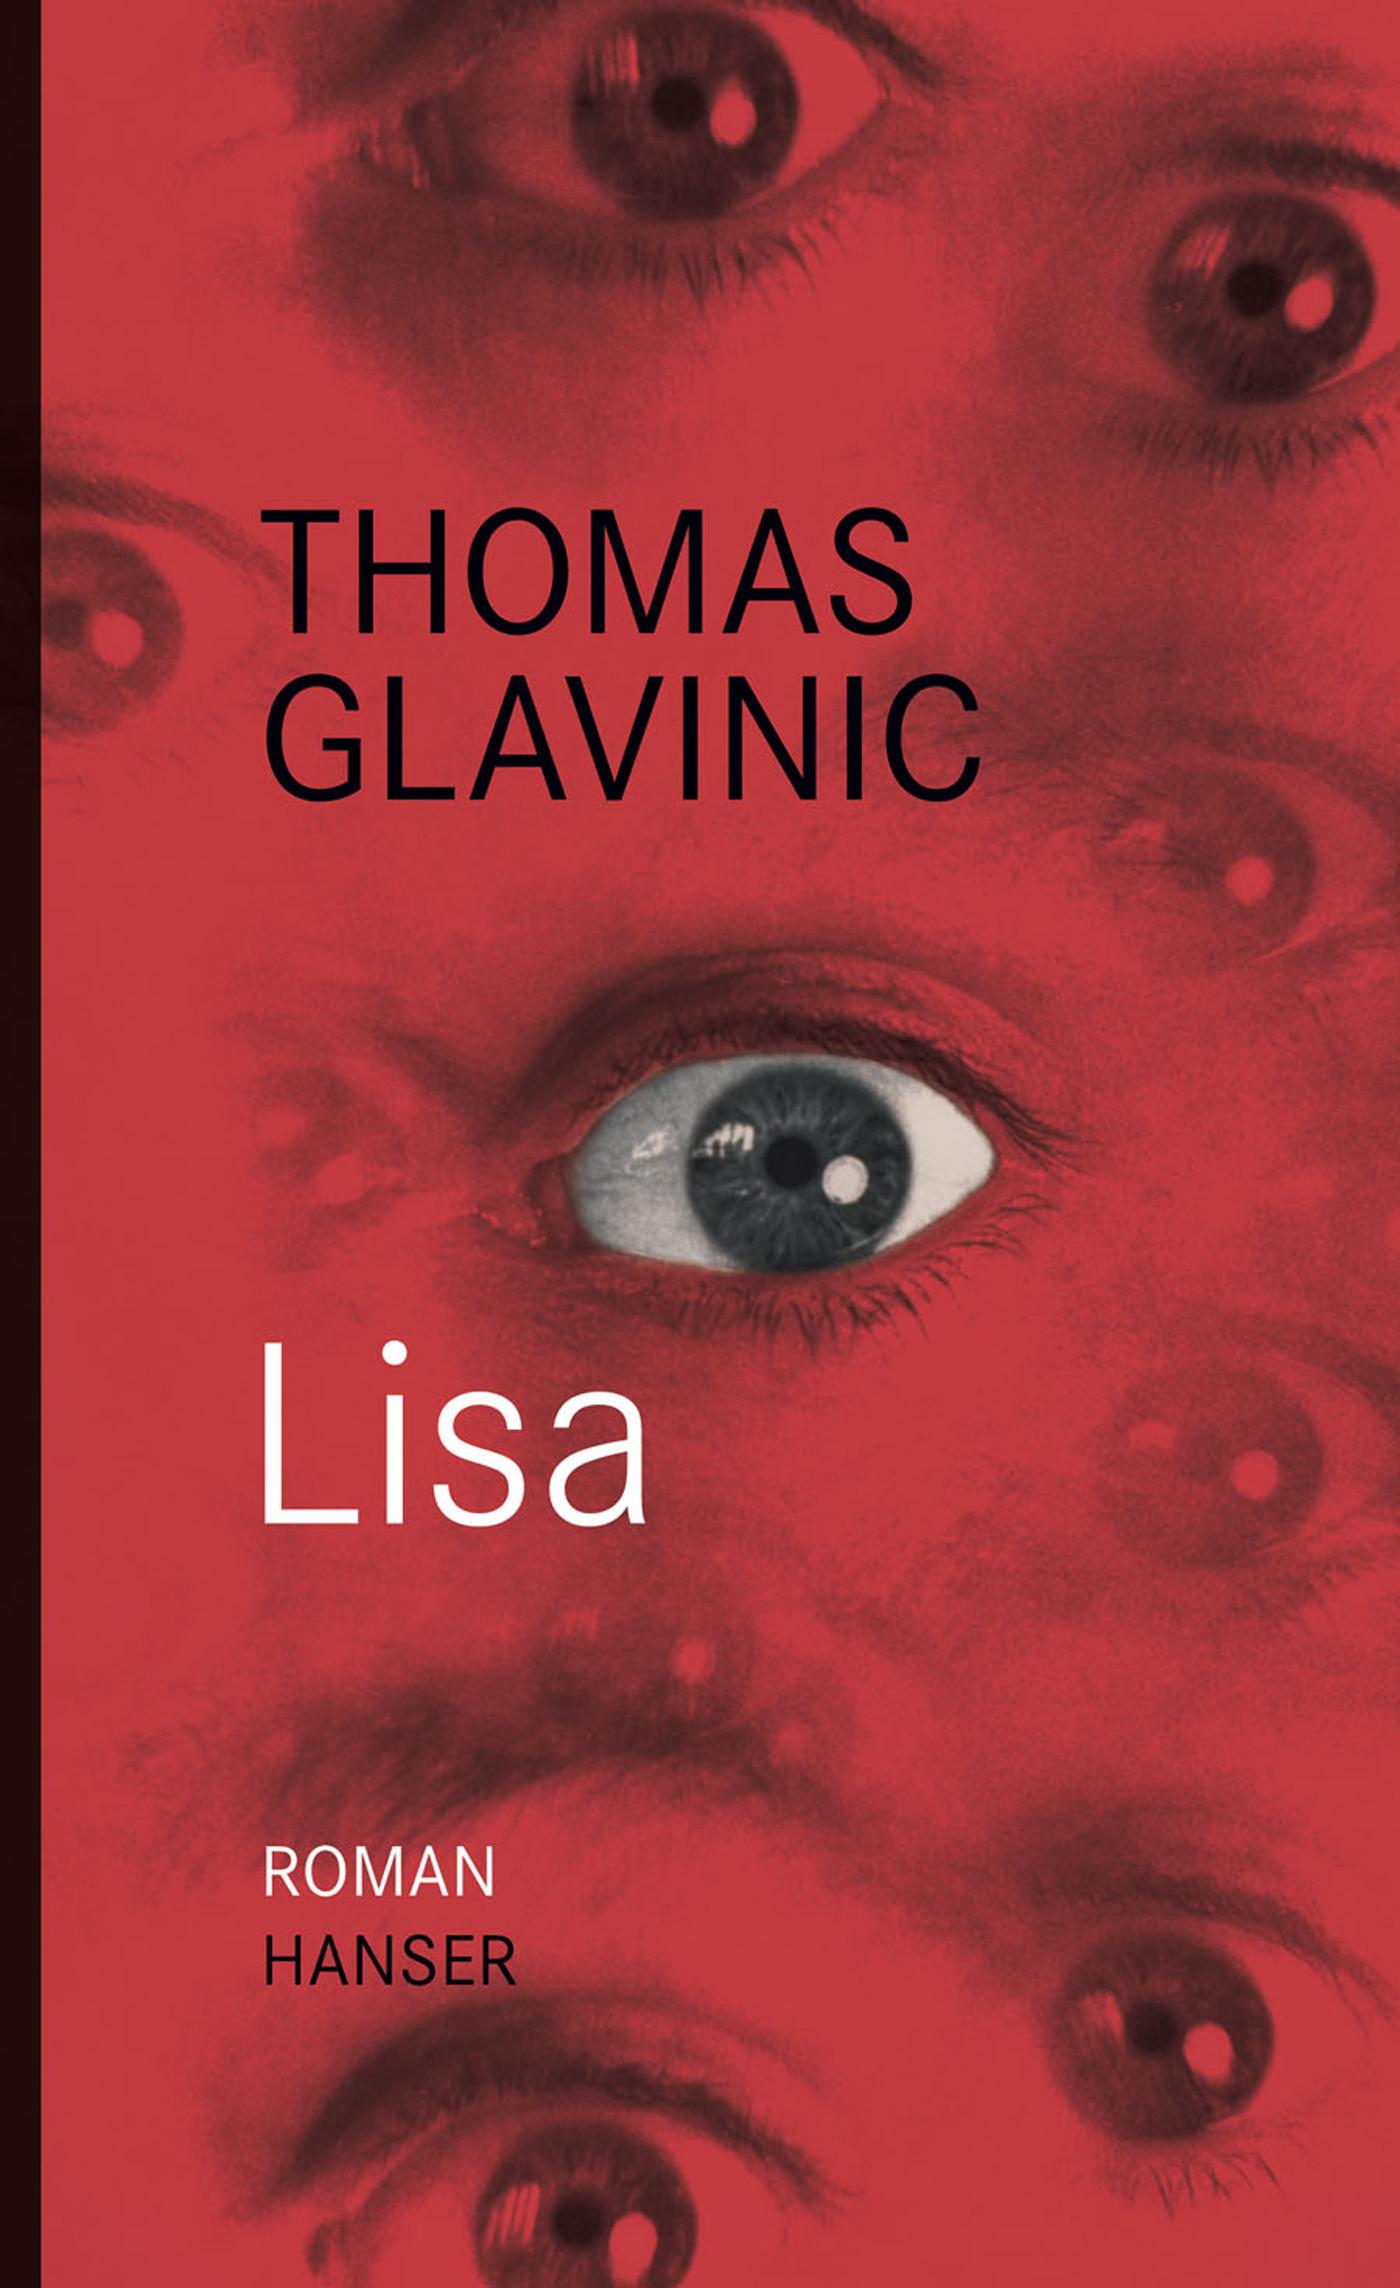 Lisa - Thomas Glavinic